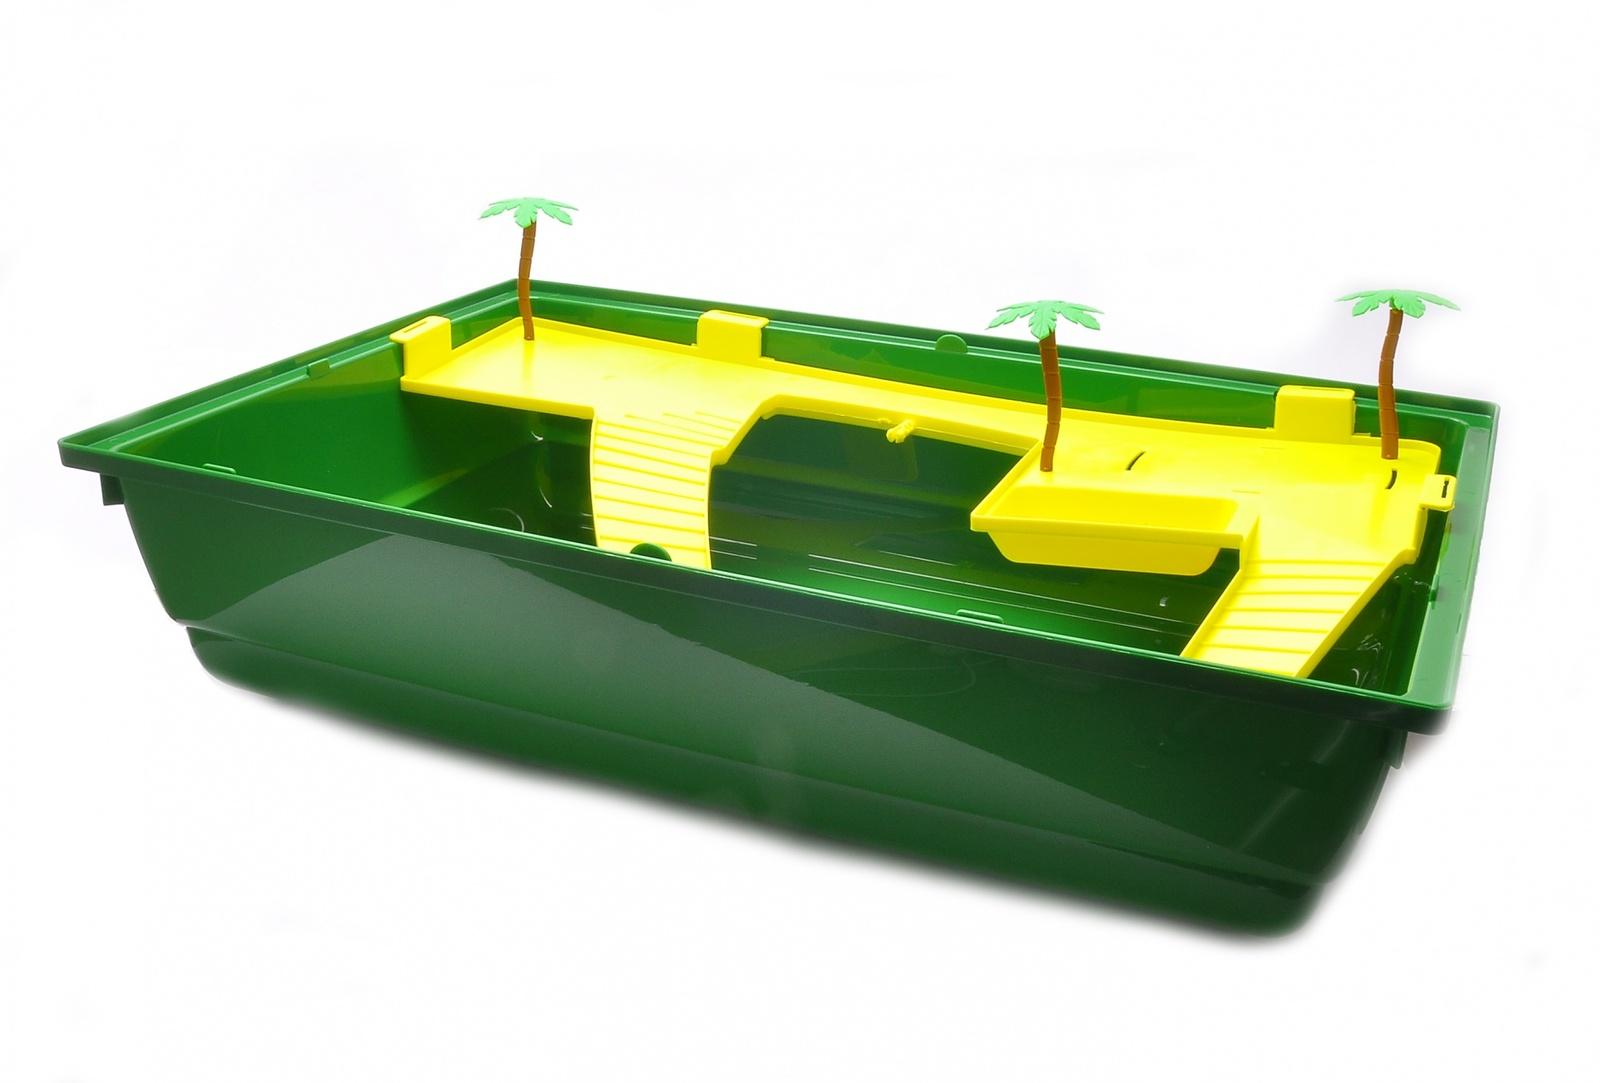 benelux Benelux Закрытый террариум для черепах L 60 * 40 * 30 см H (Turtle box large) 447 50472